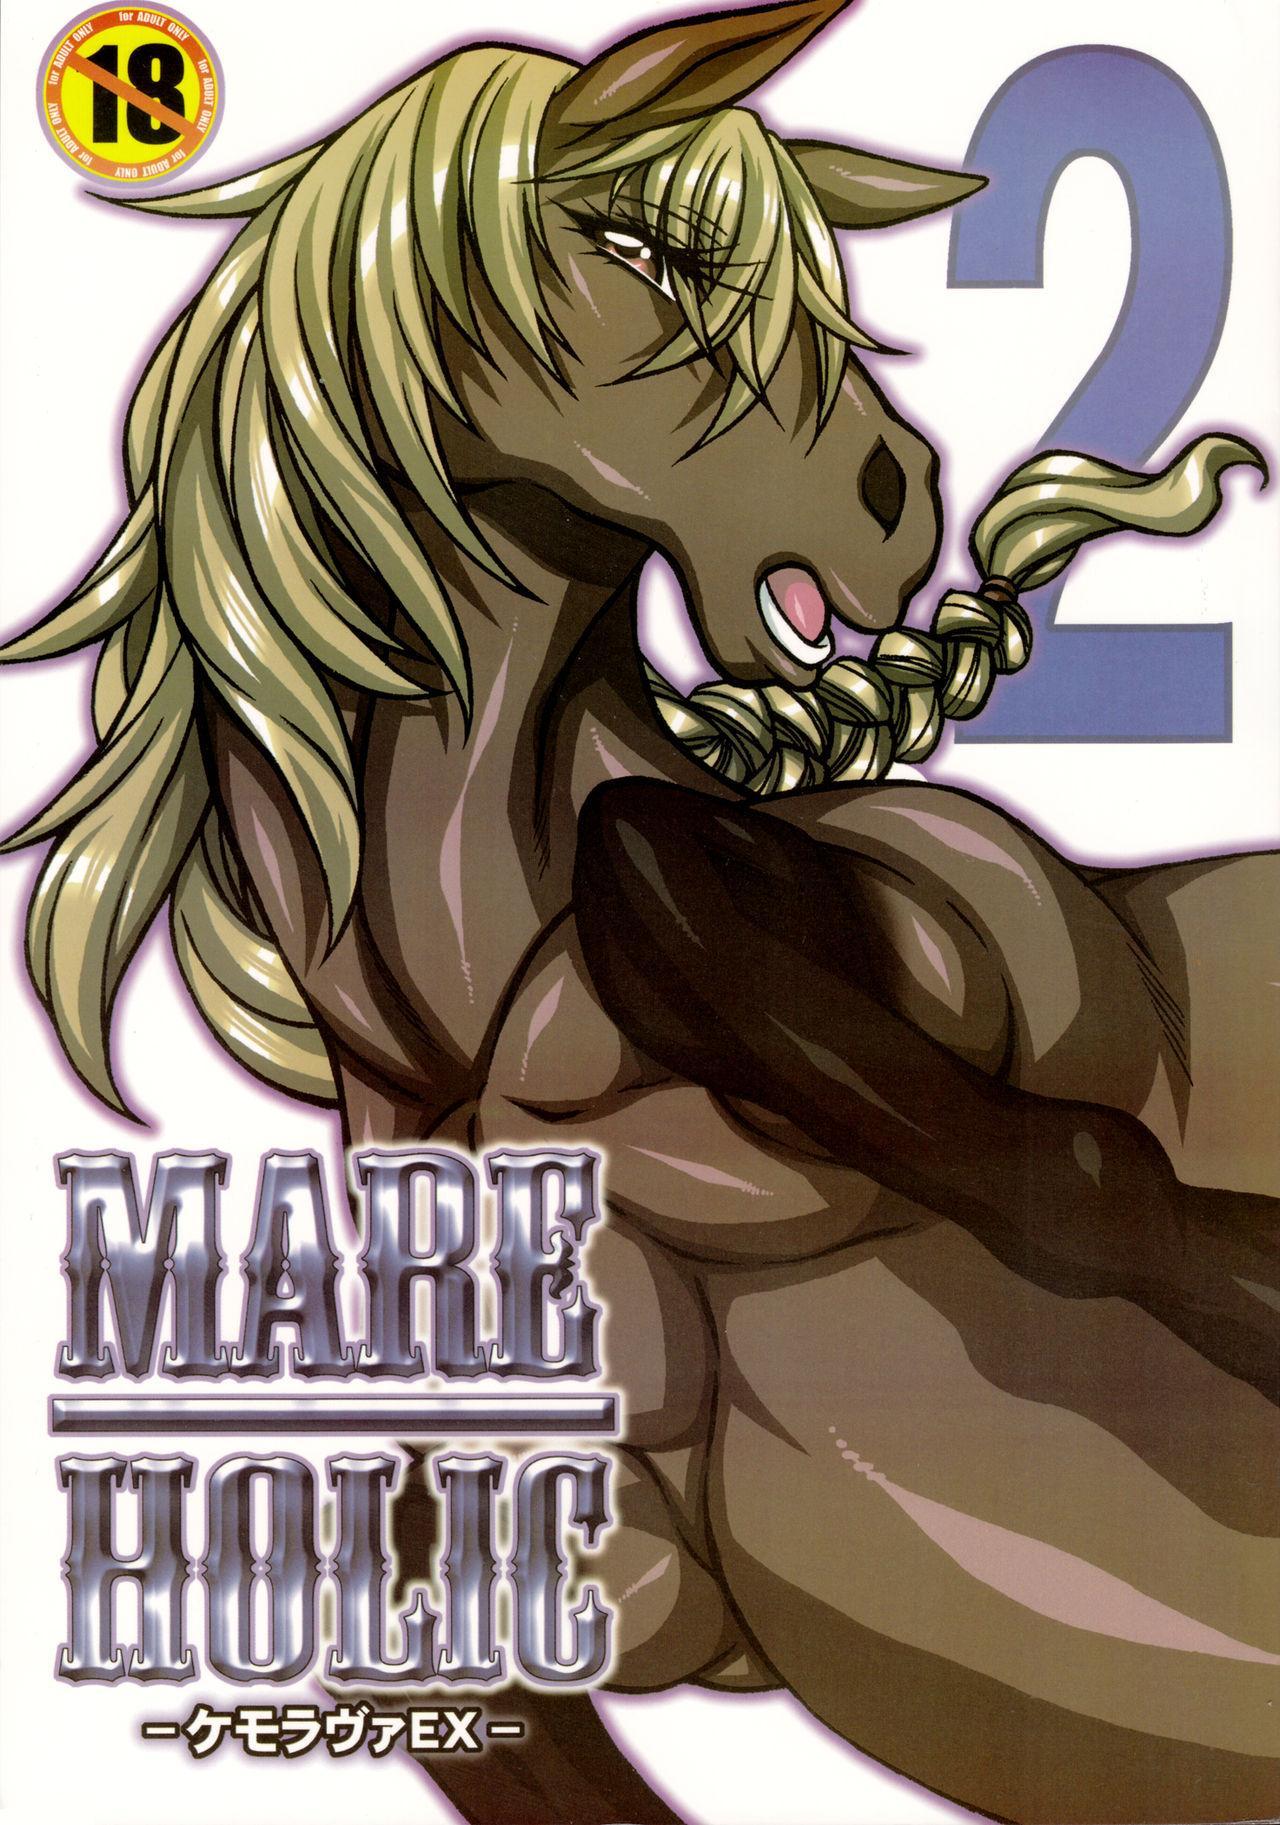 (Kemoket 3) [Mayoineko (Various)] Mare Holic 2 Kemolover EX ch 3-5, 11, 34-35 [English] =LWB= 0